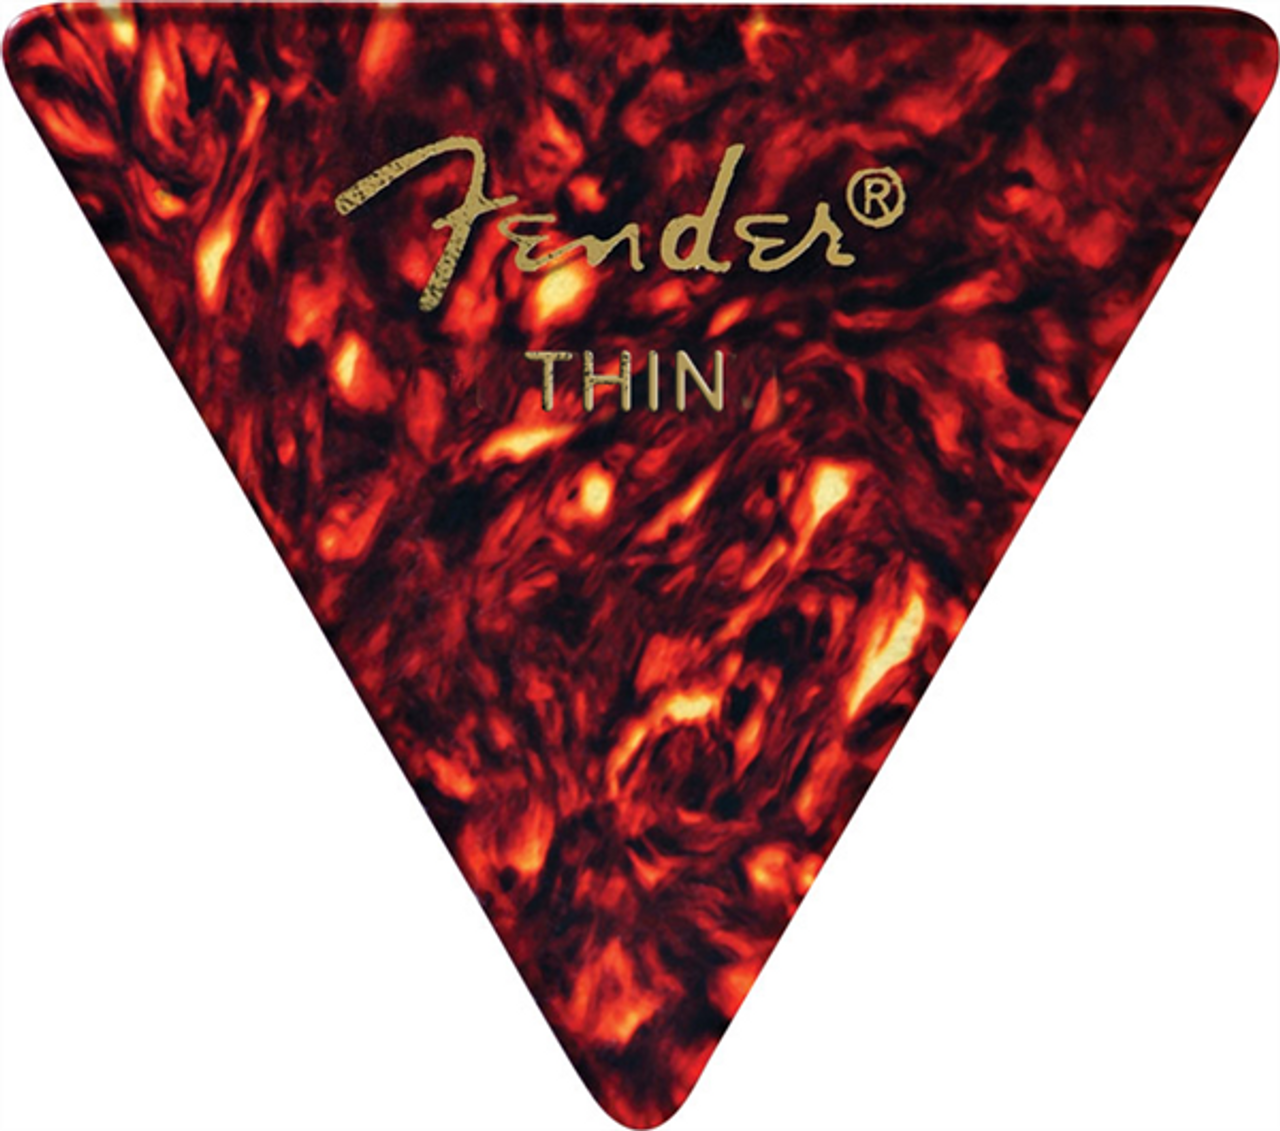 Fender 355 Shape Classic Celluloid Picks Thin - 1/2 GROSS (72 COUNT)